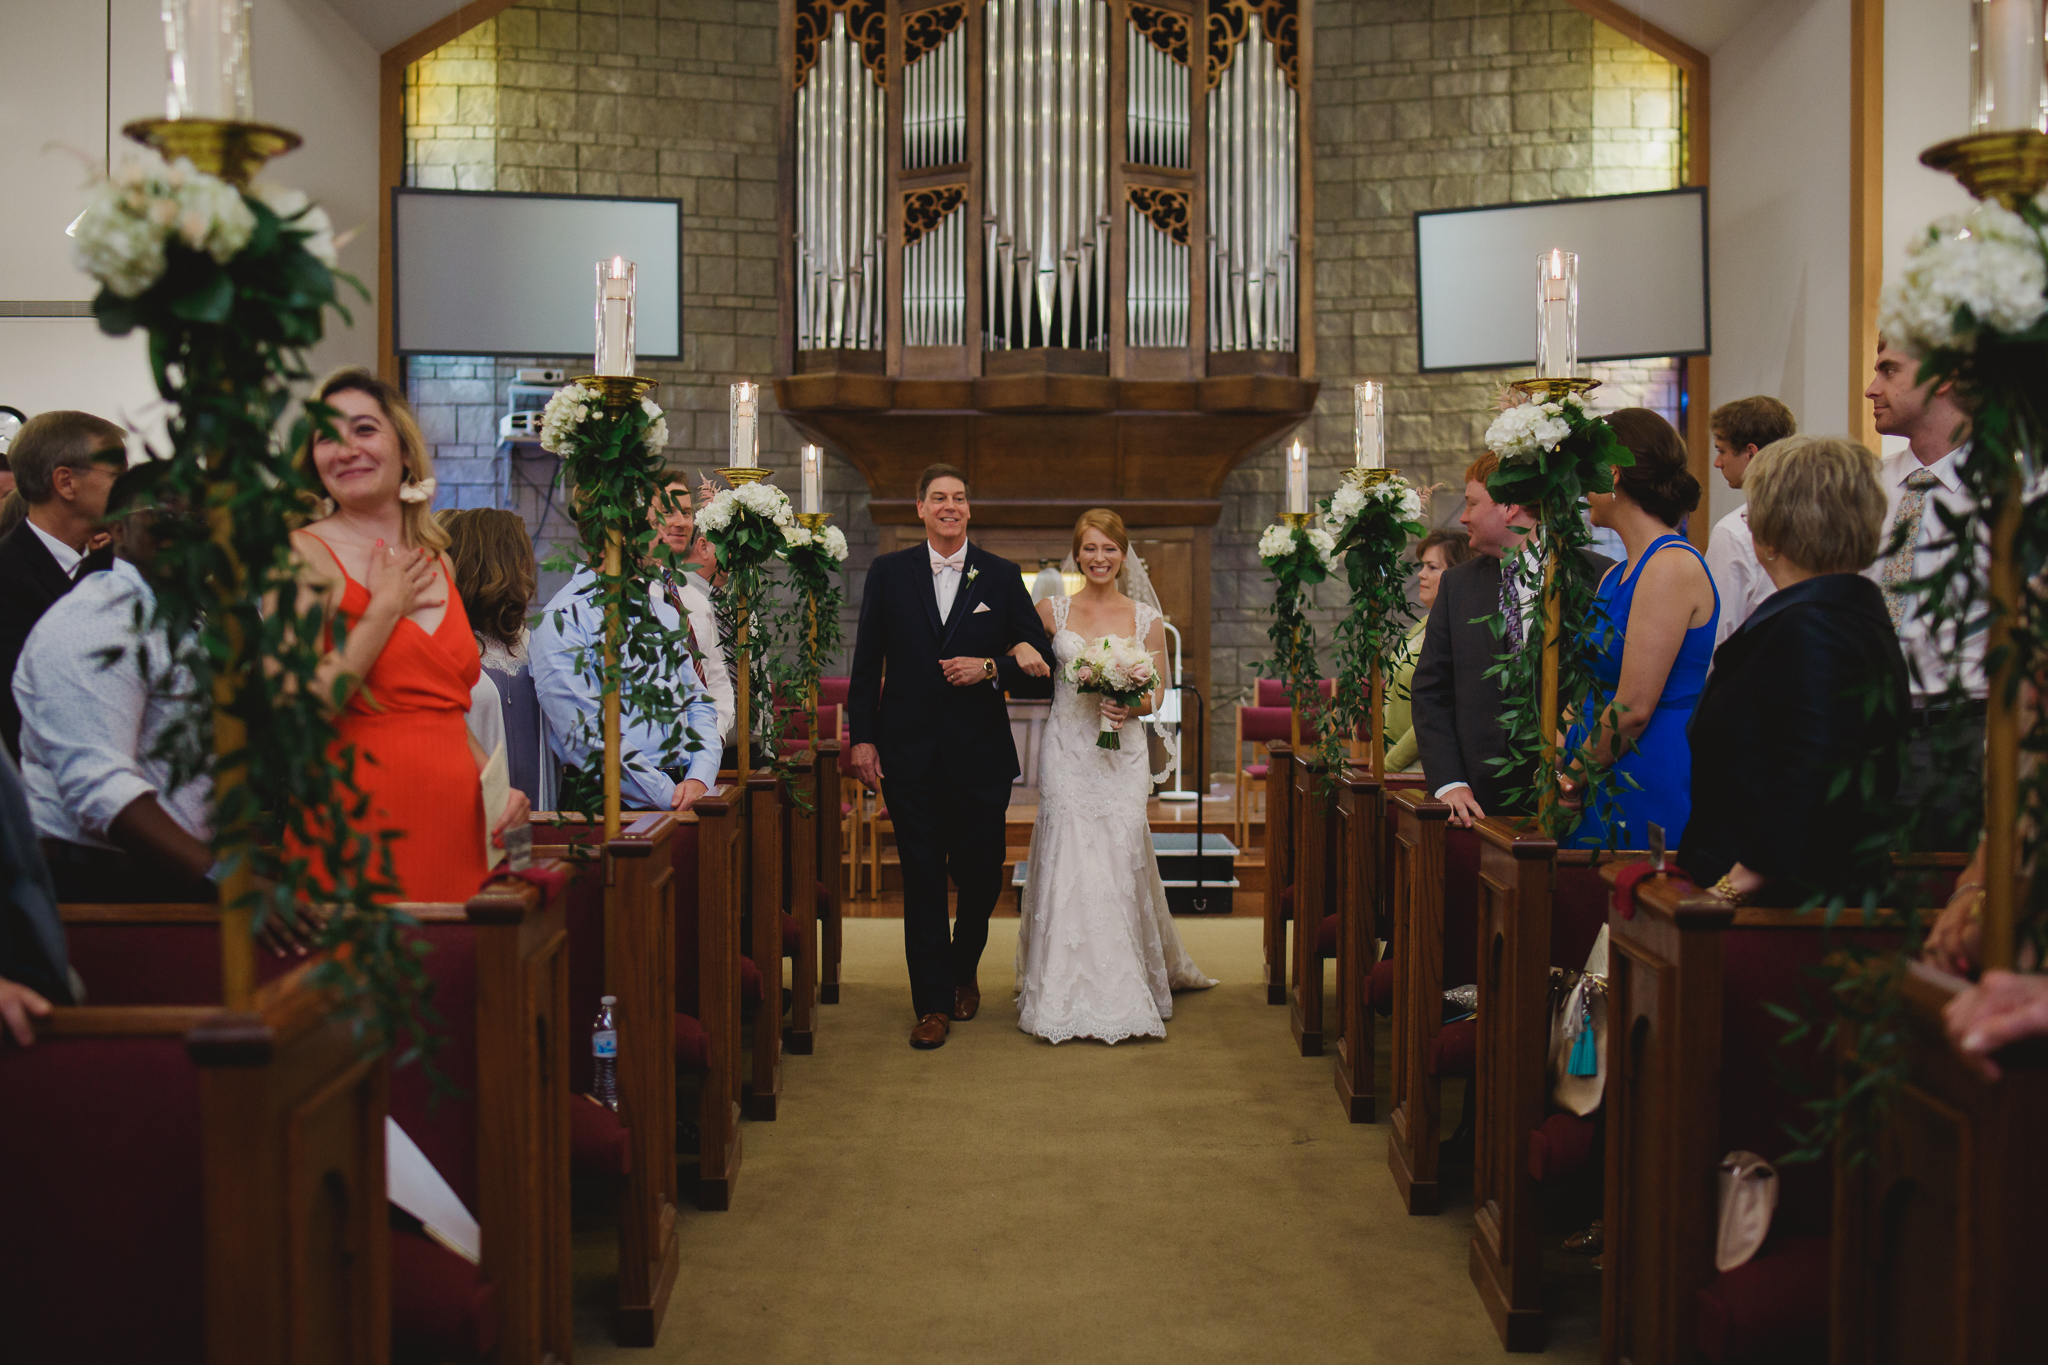 Michael and Kelly - the ashton depot - wedding DFW - wedding photographer- elizalde photography (30 of 150).jpg